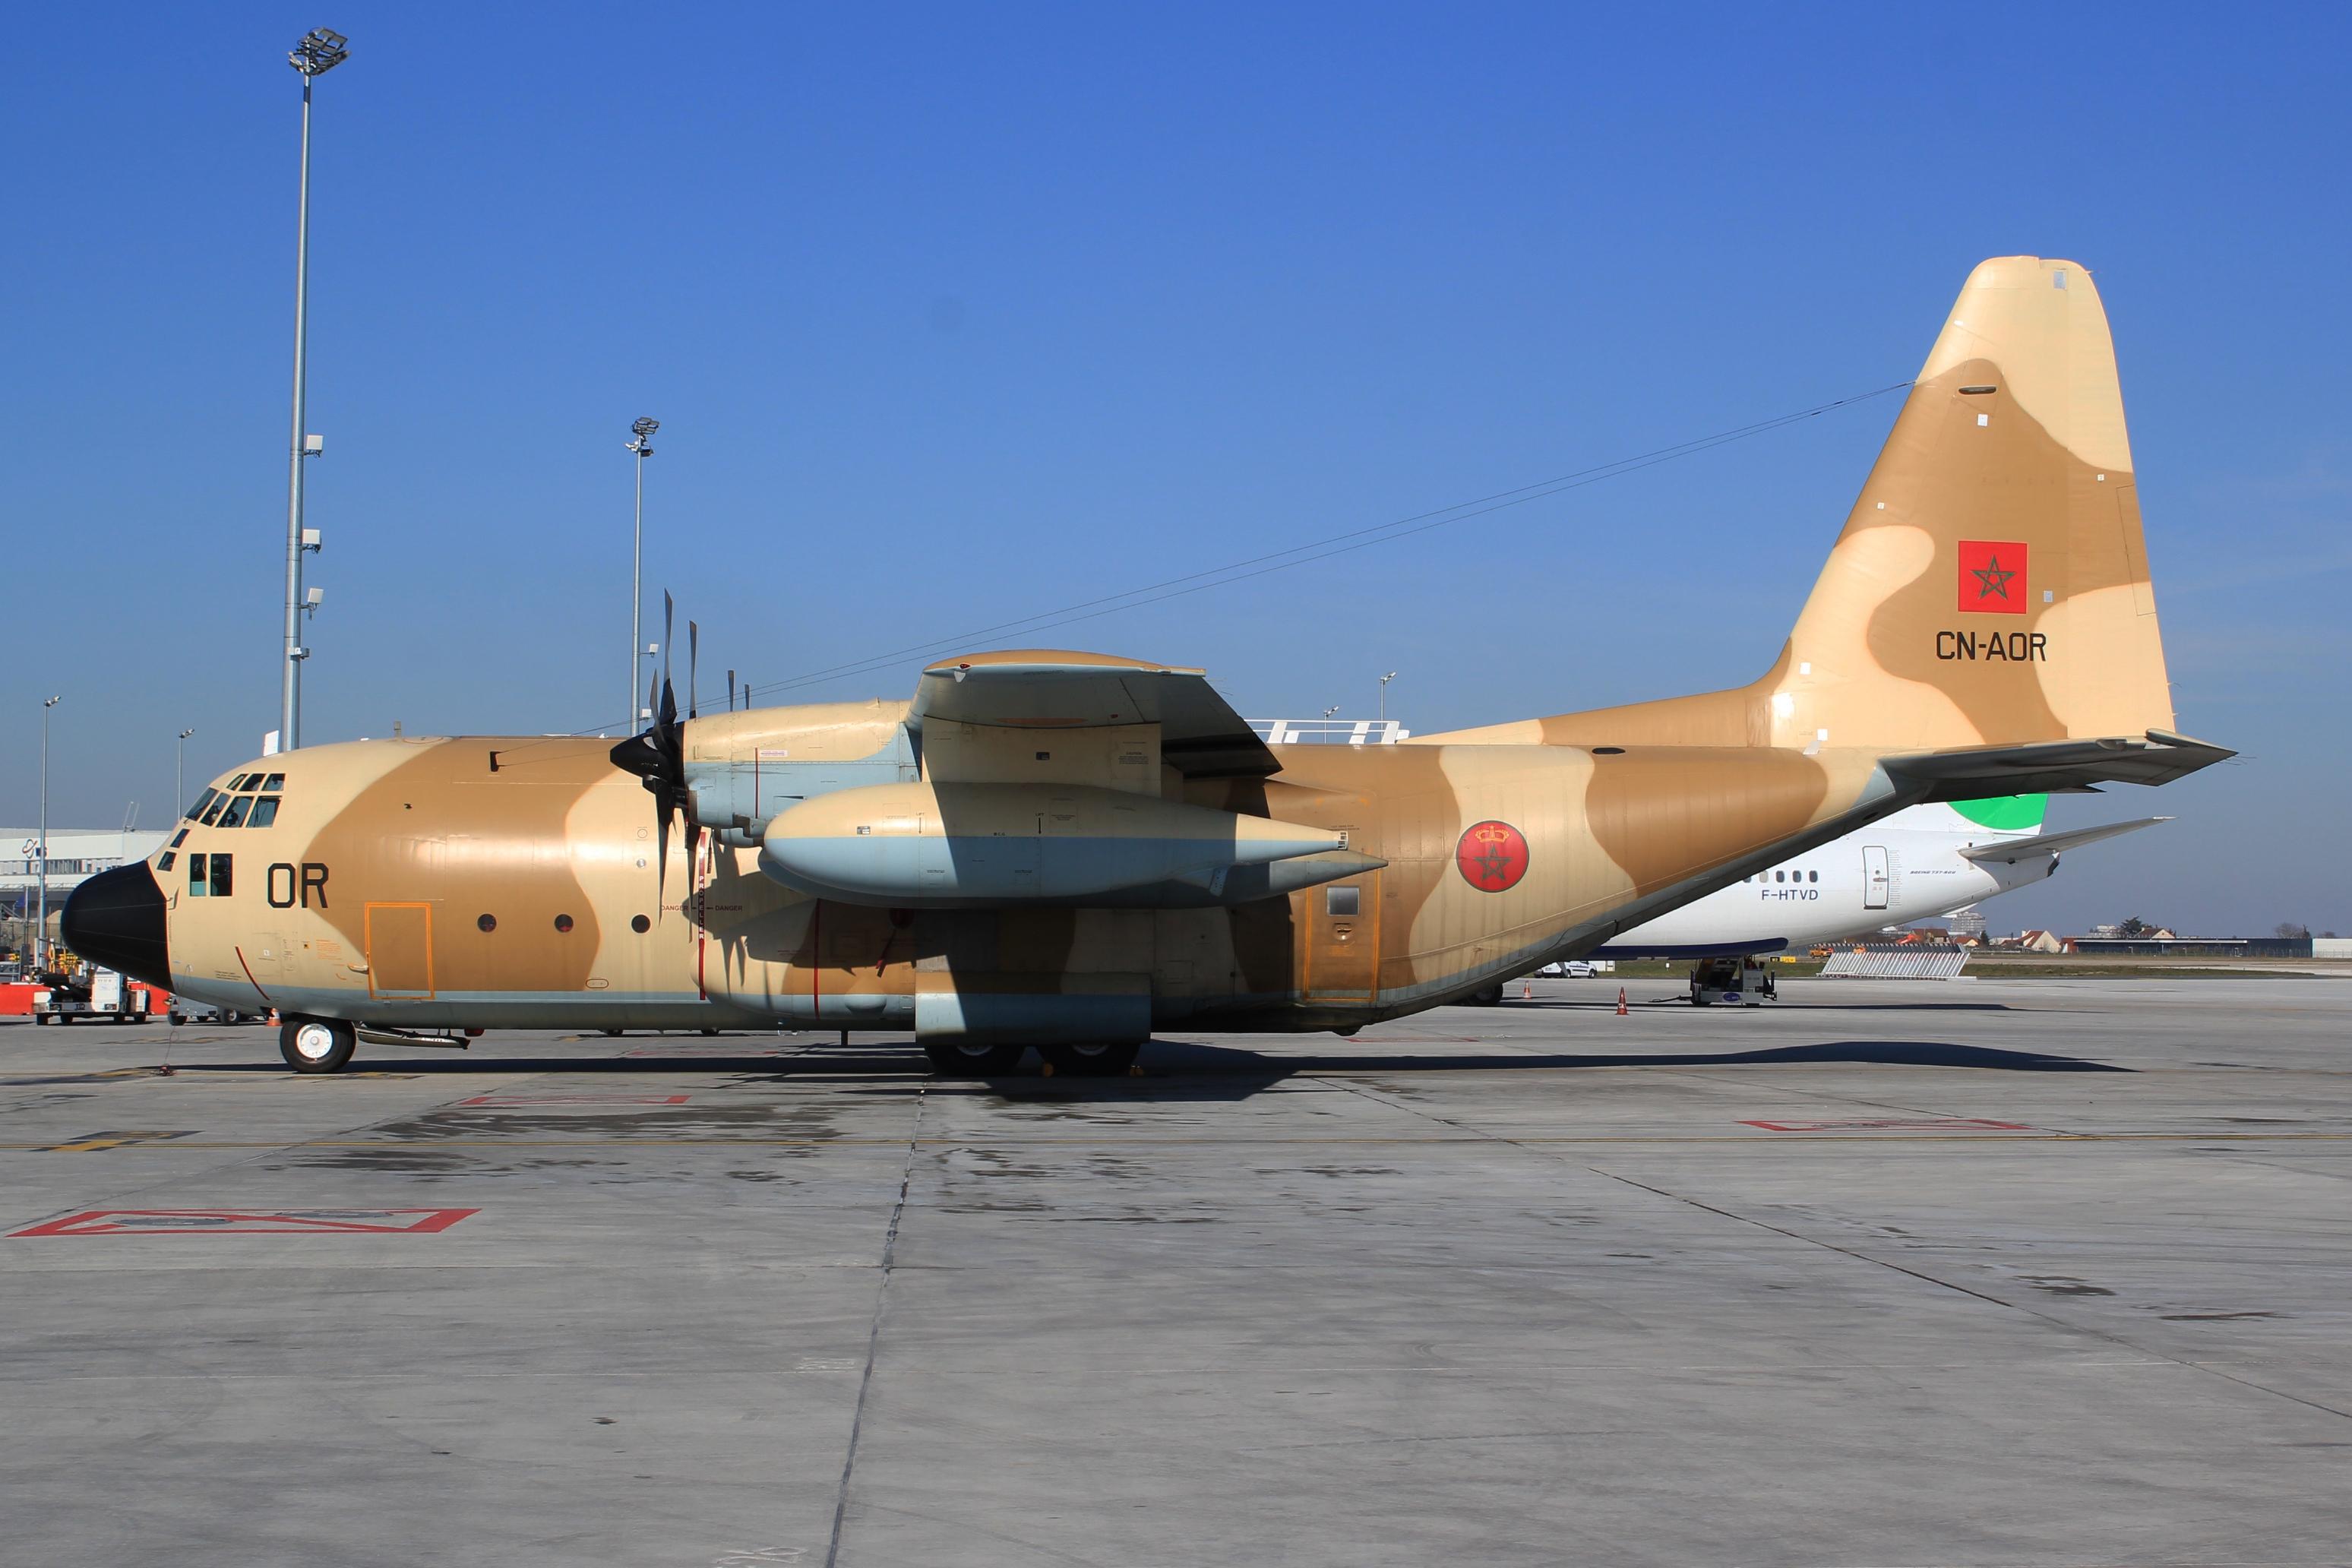 FRA: Photos d'avions de transport - Page 37 46318908595_f4d4969afa_o